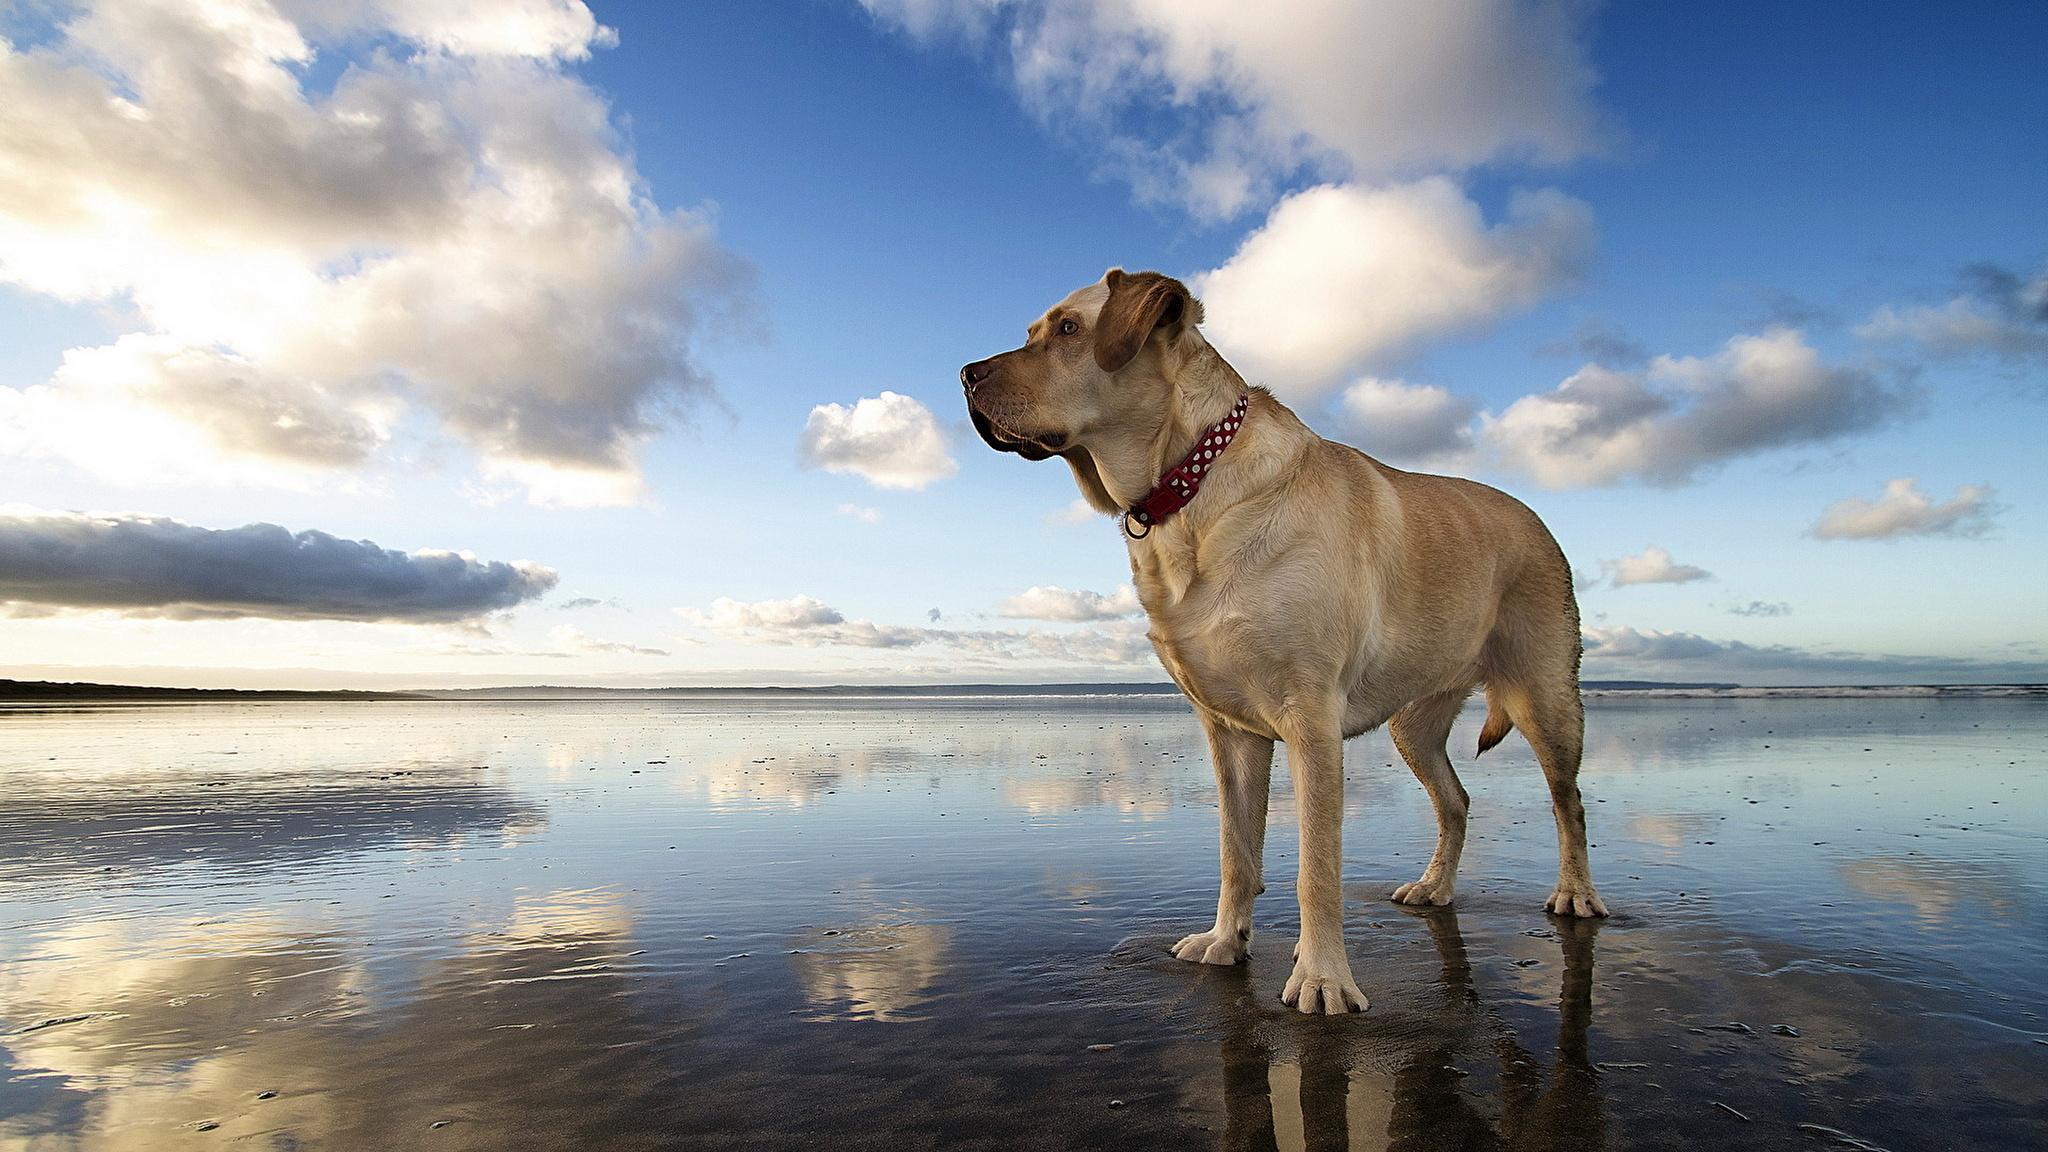 собака песок вода животное природа  № 956855 бесплатно